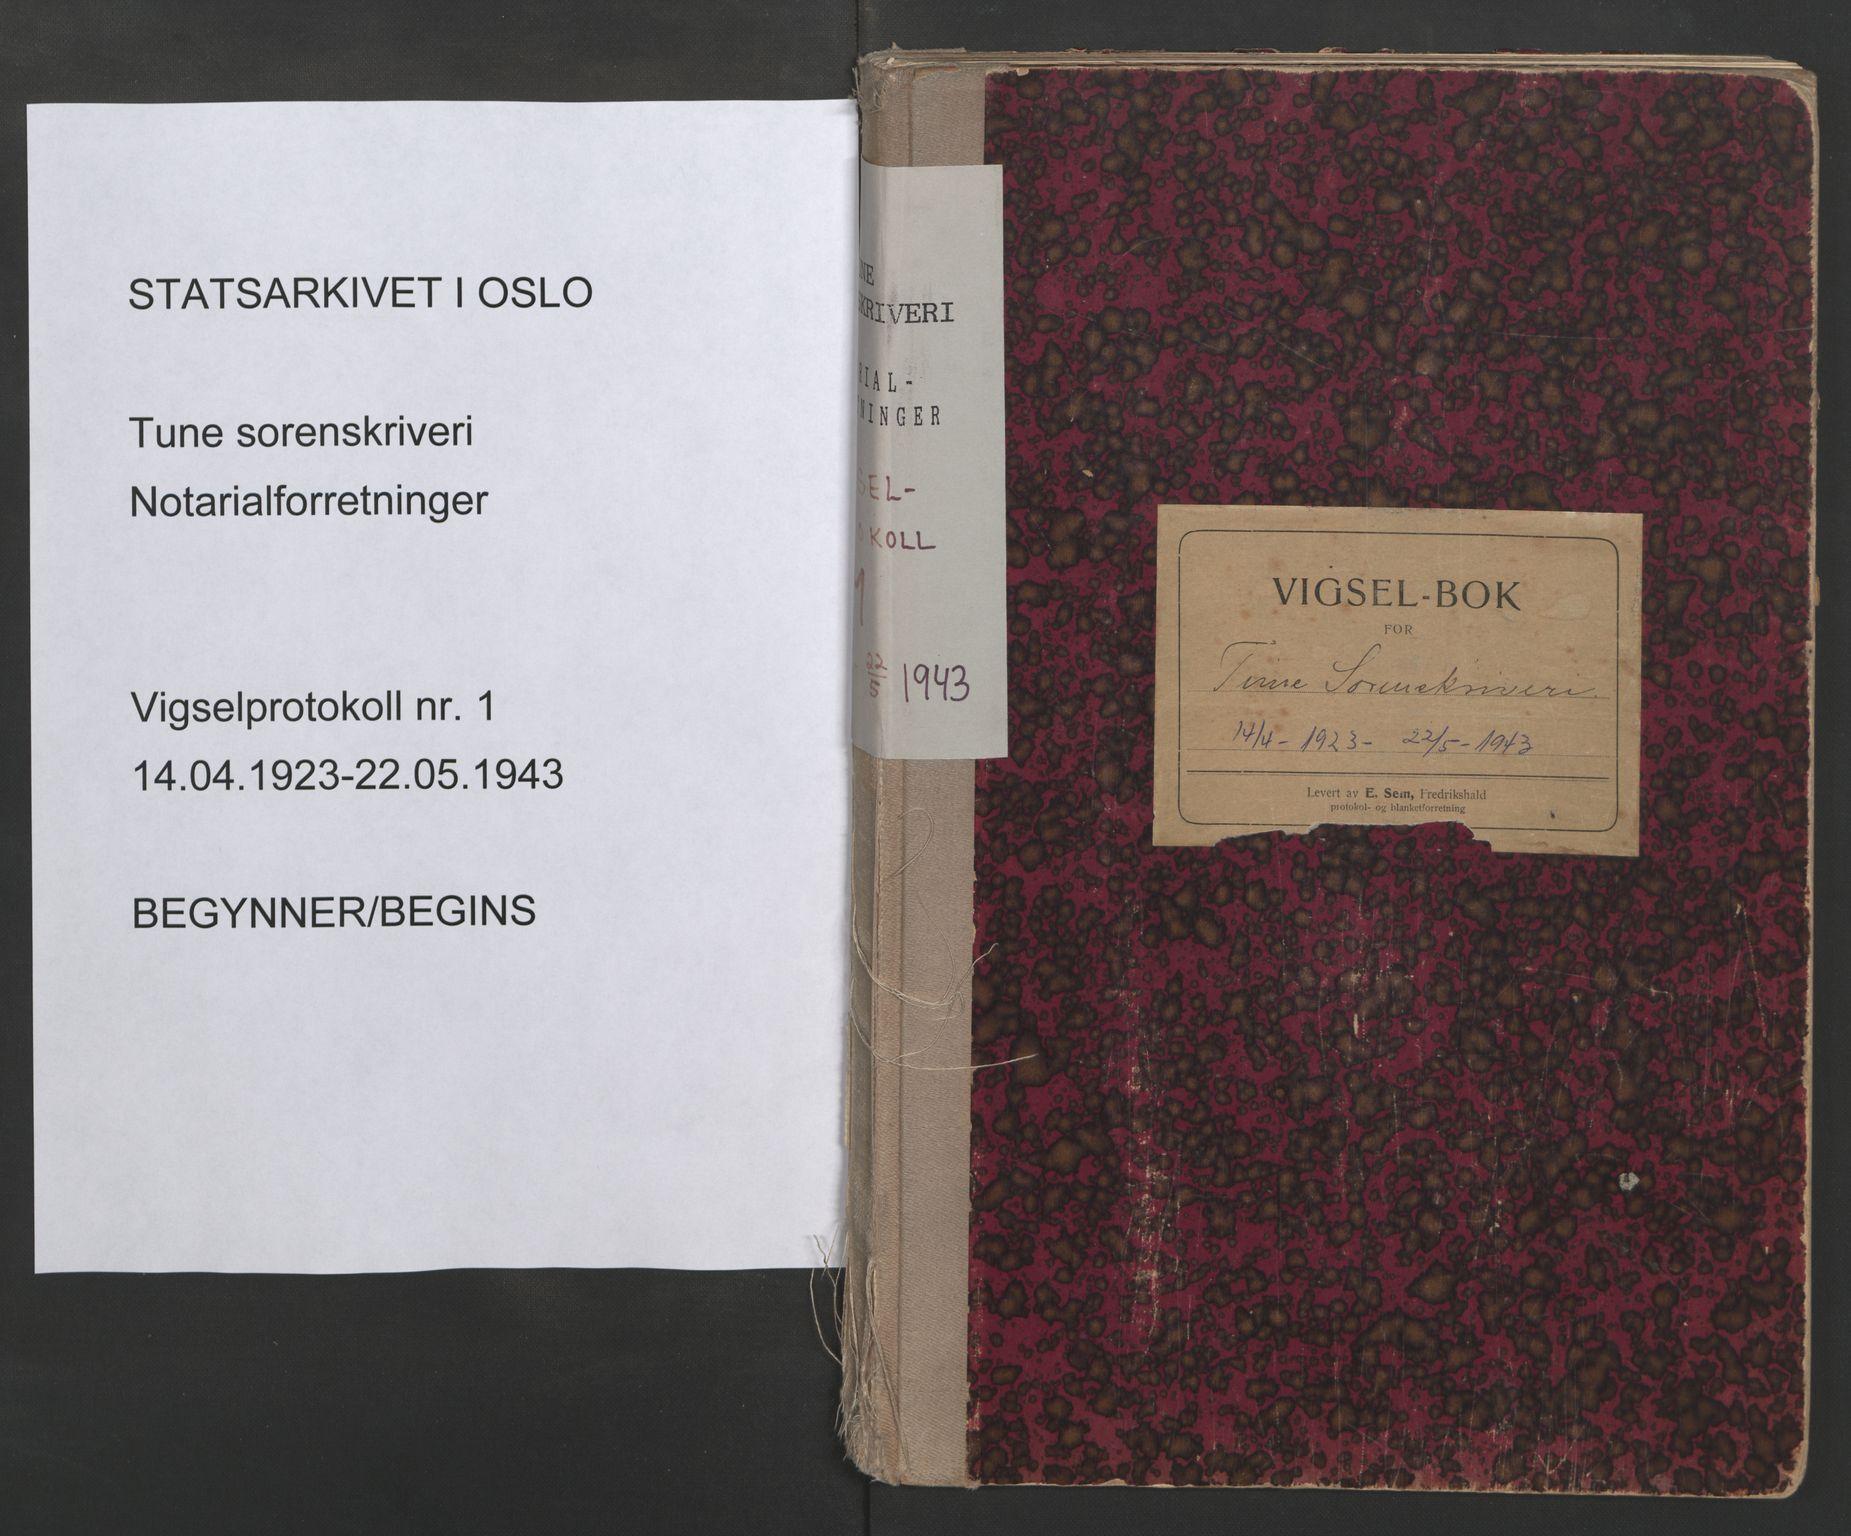 SAO, Tune sorenskriveri, L/Lb/L0001: Vigselprotokoll, 1923-1943, s. upaginert